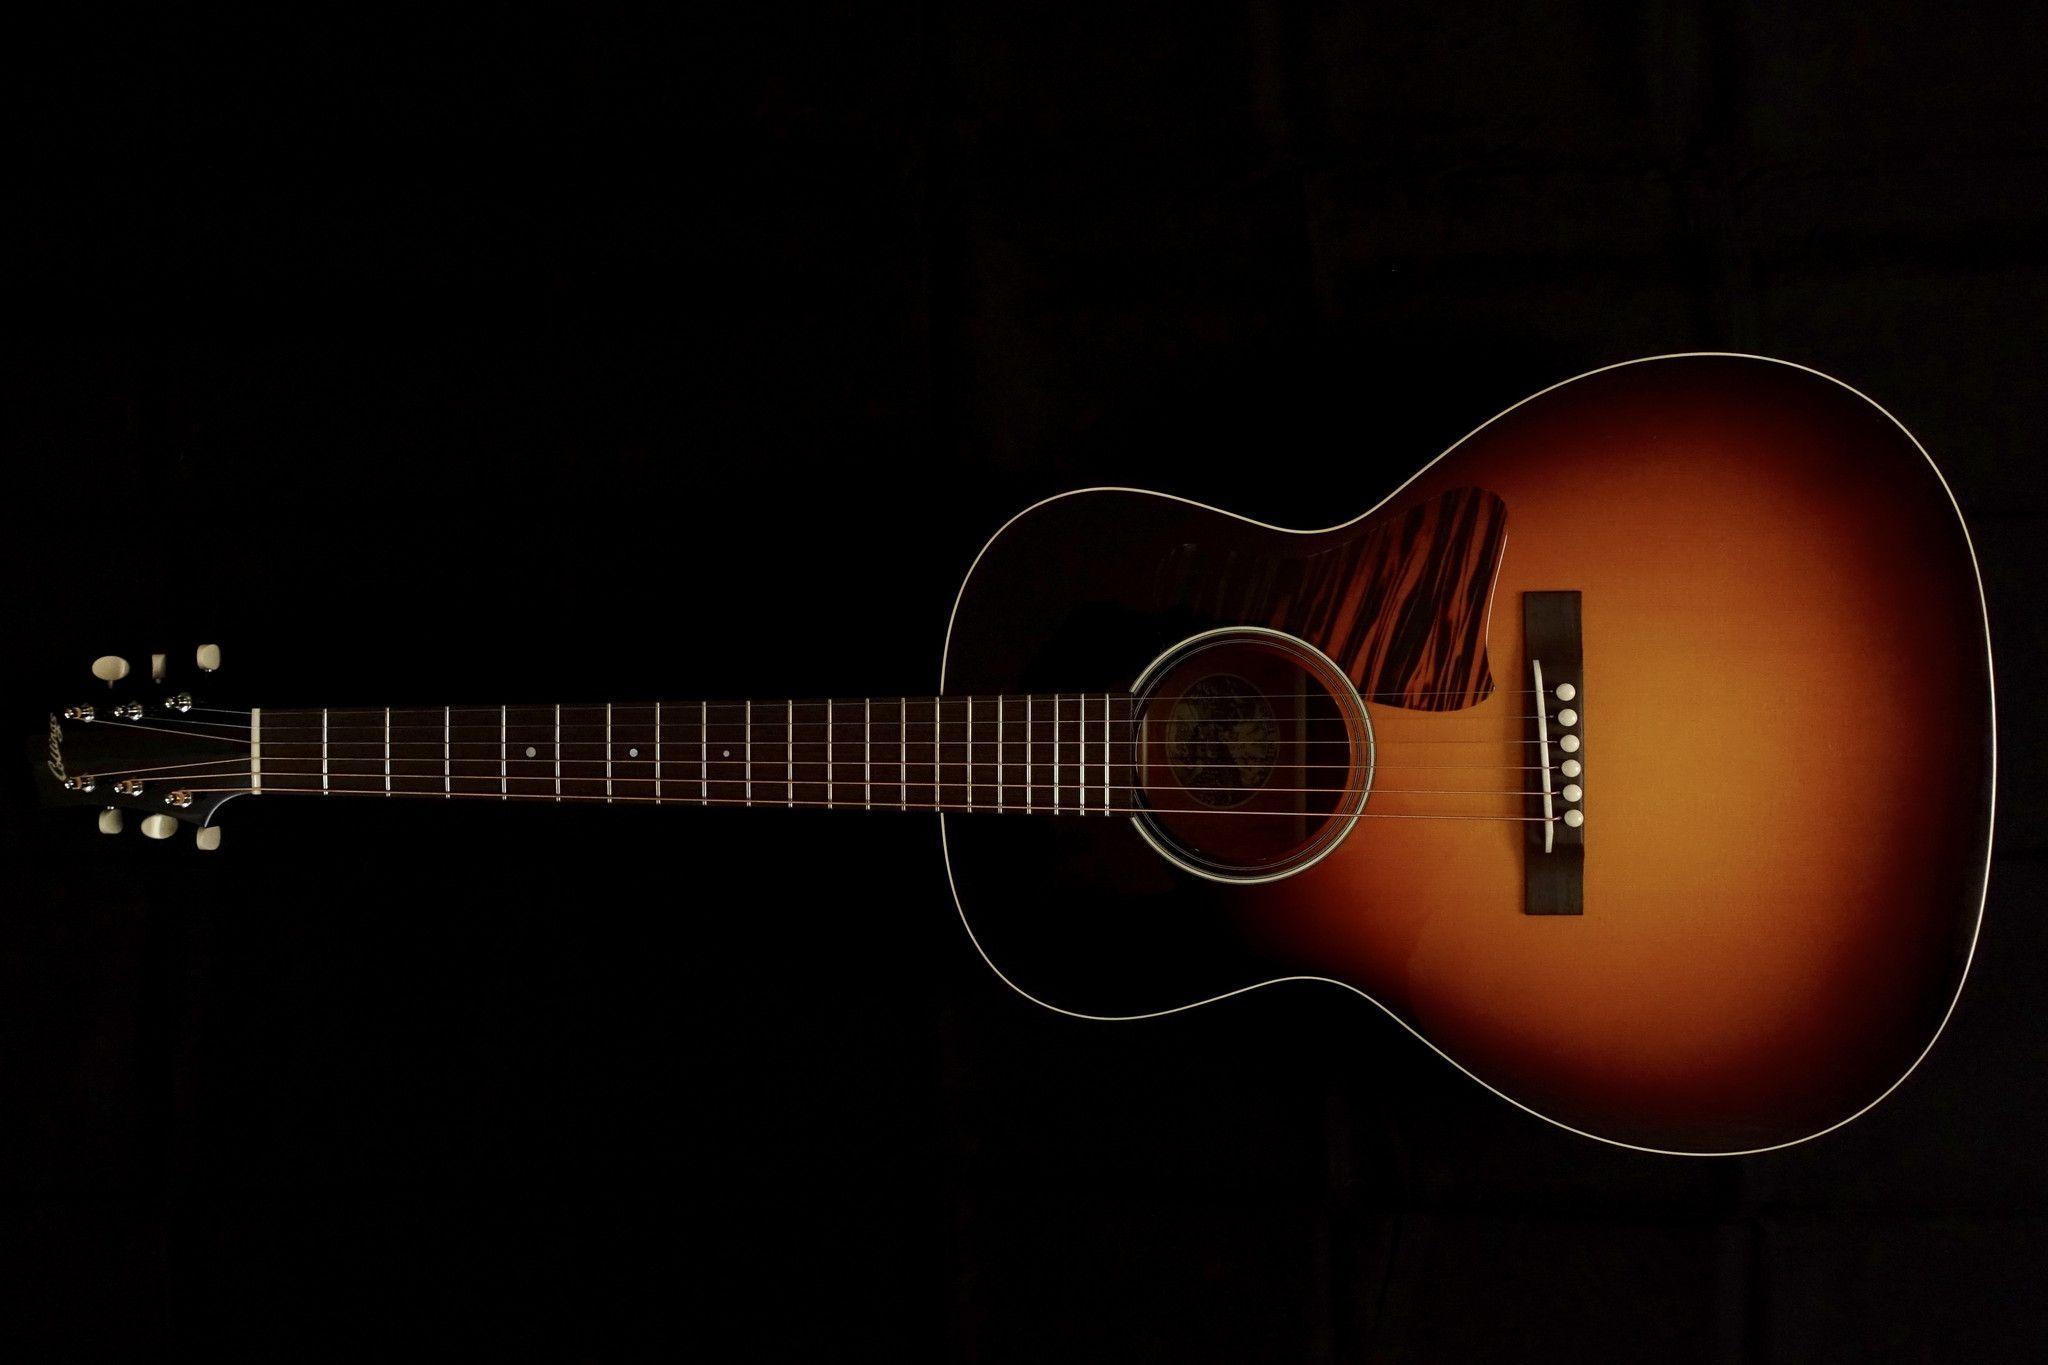 Collings C10 35 G SB Acoustic Guitar